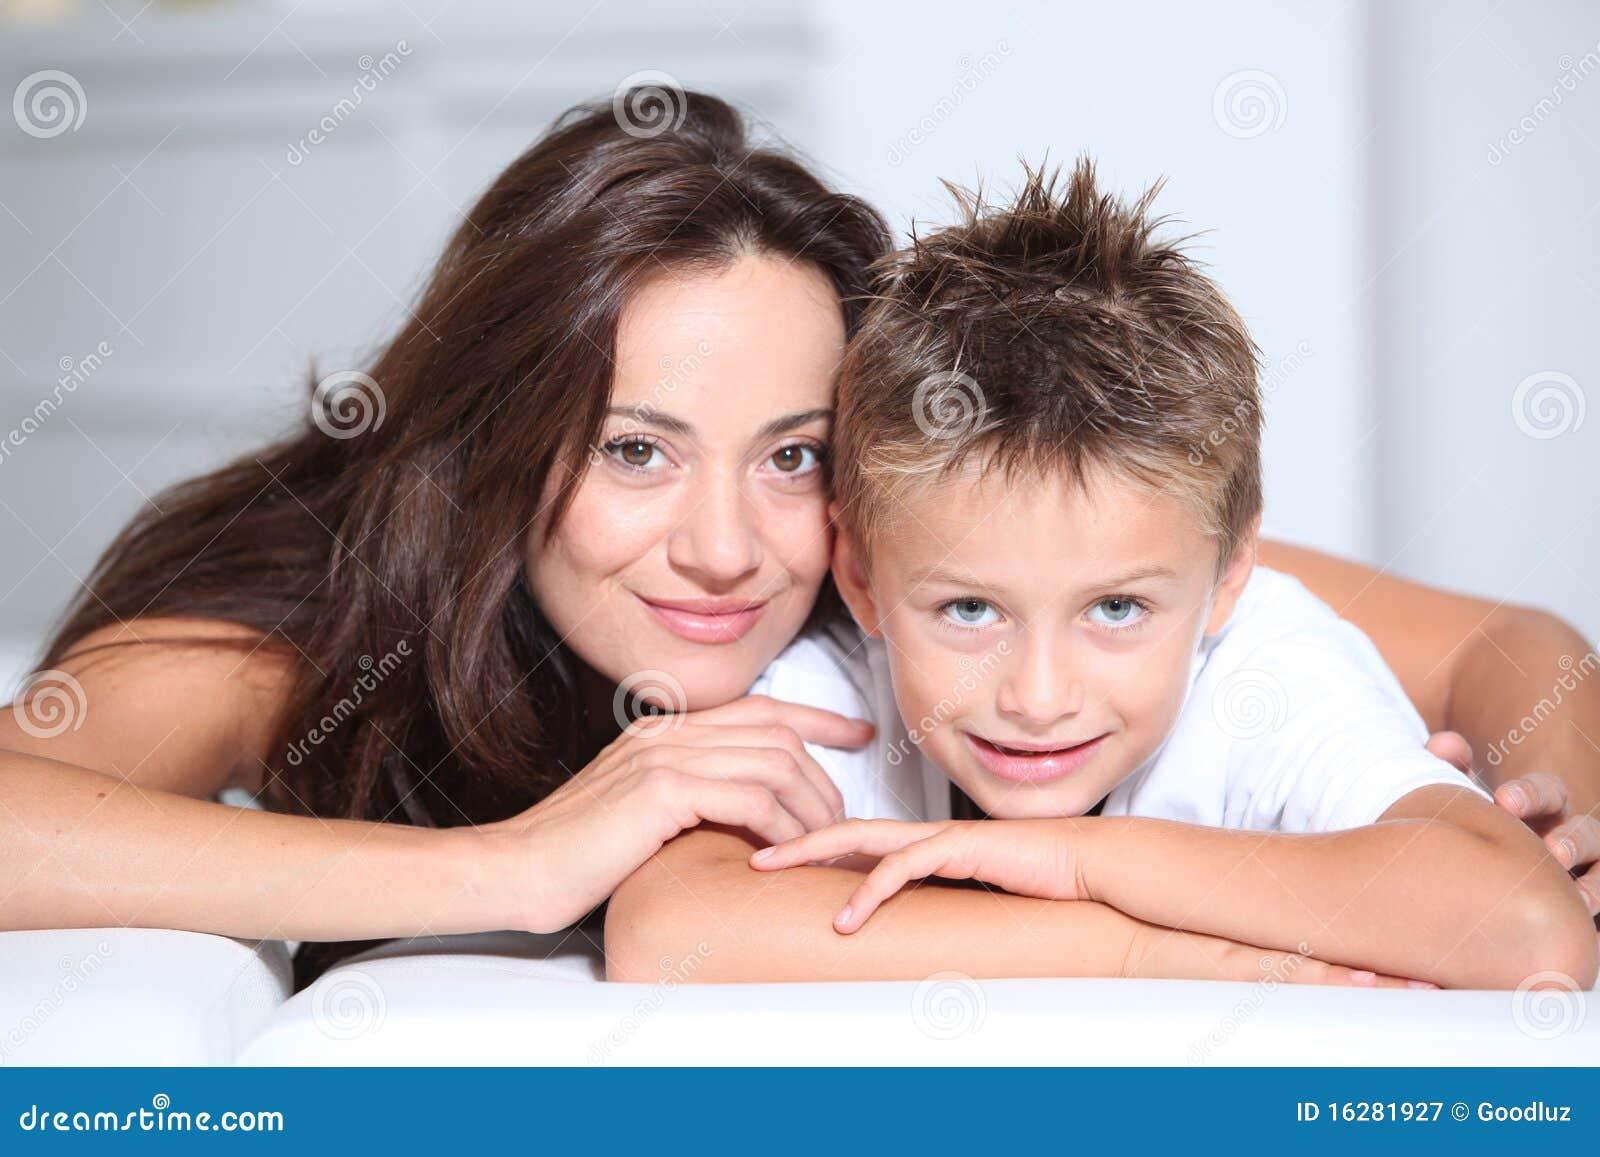 Сын мать фото 24 фотография